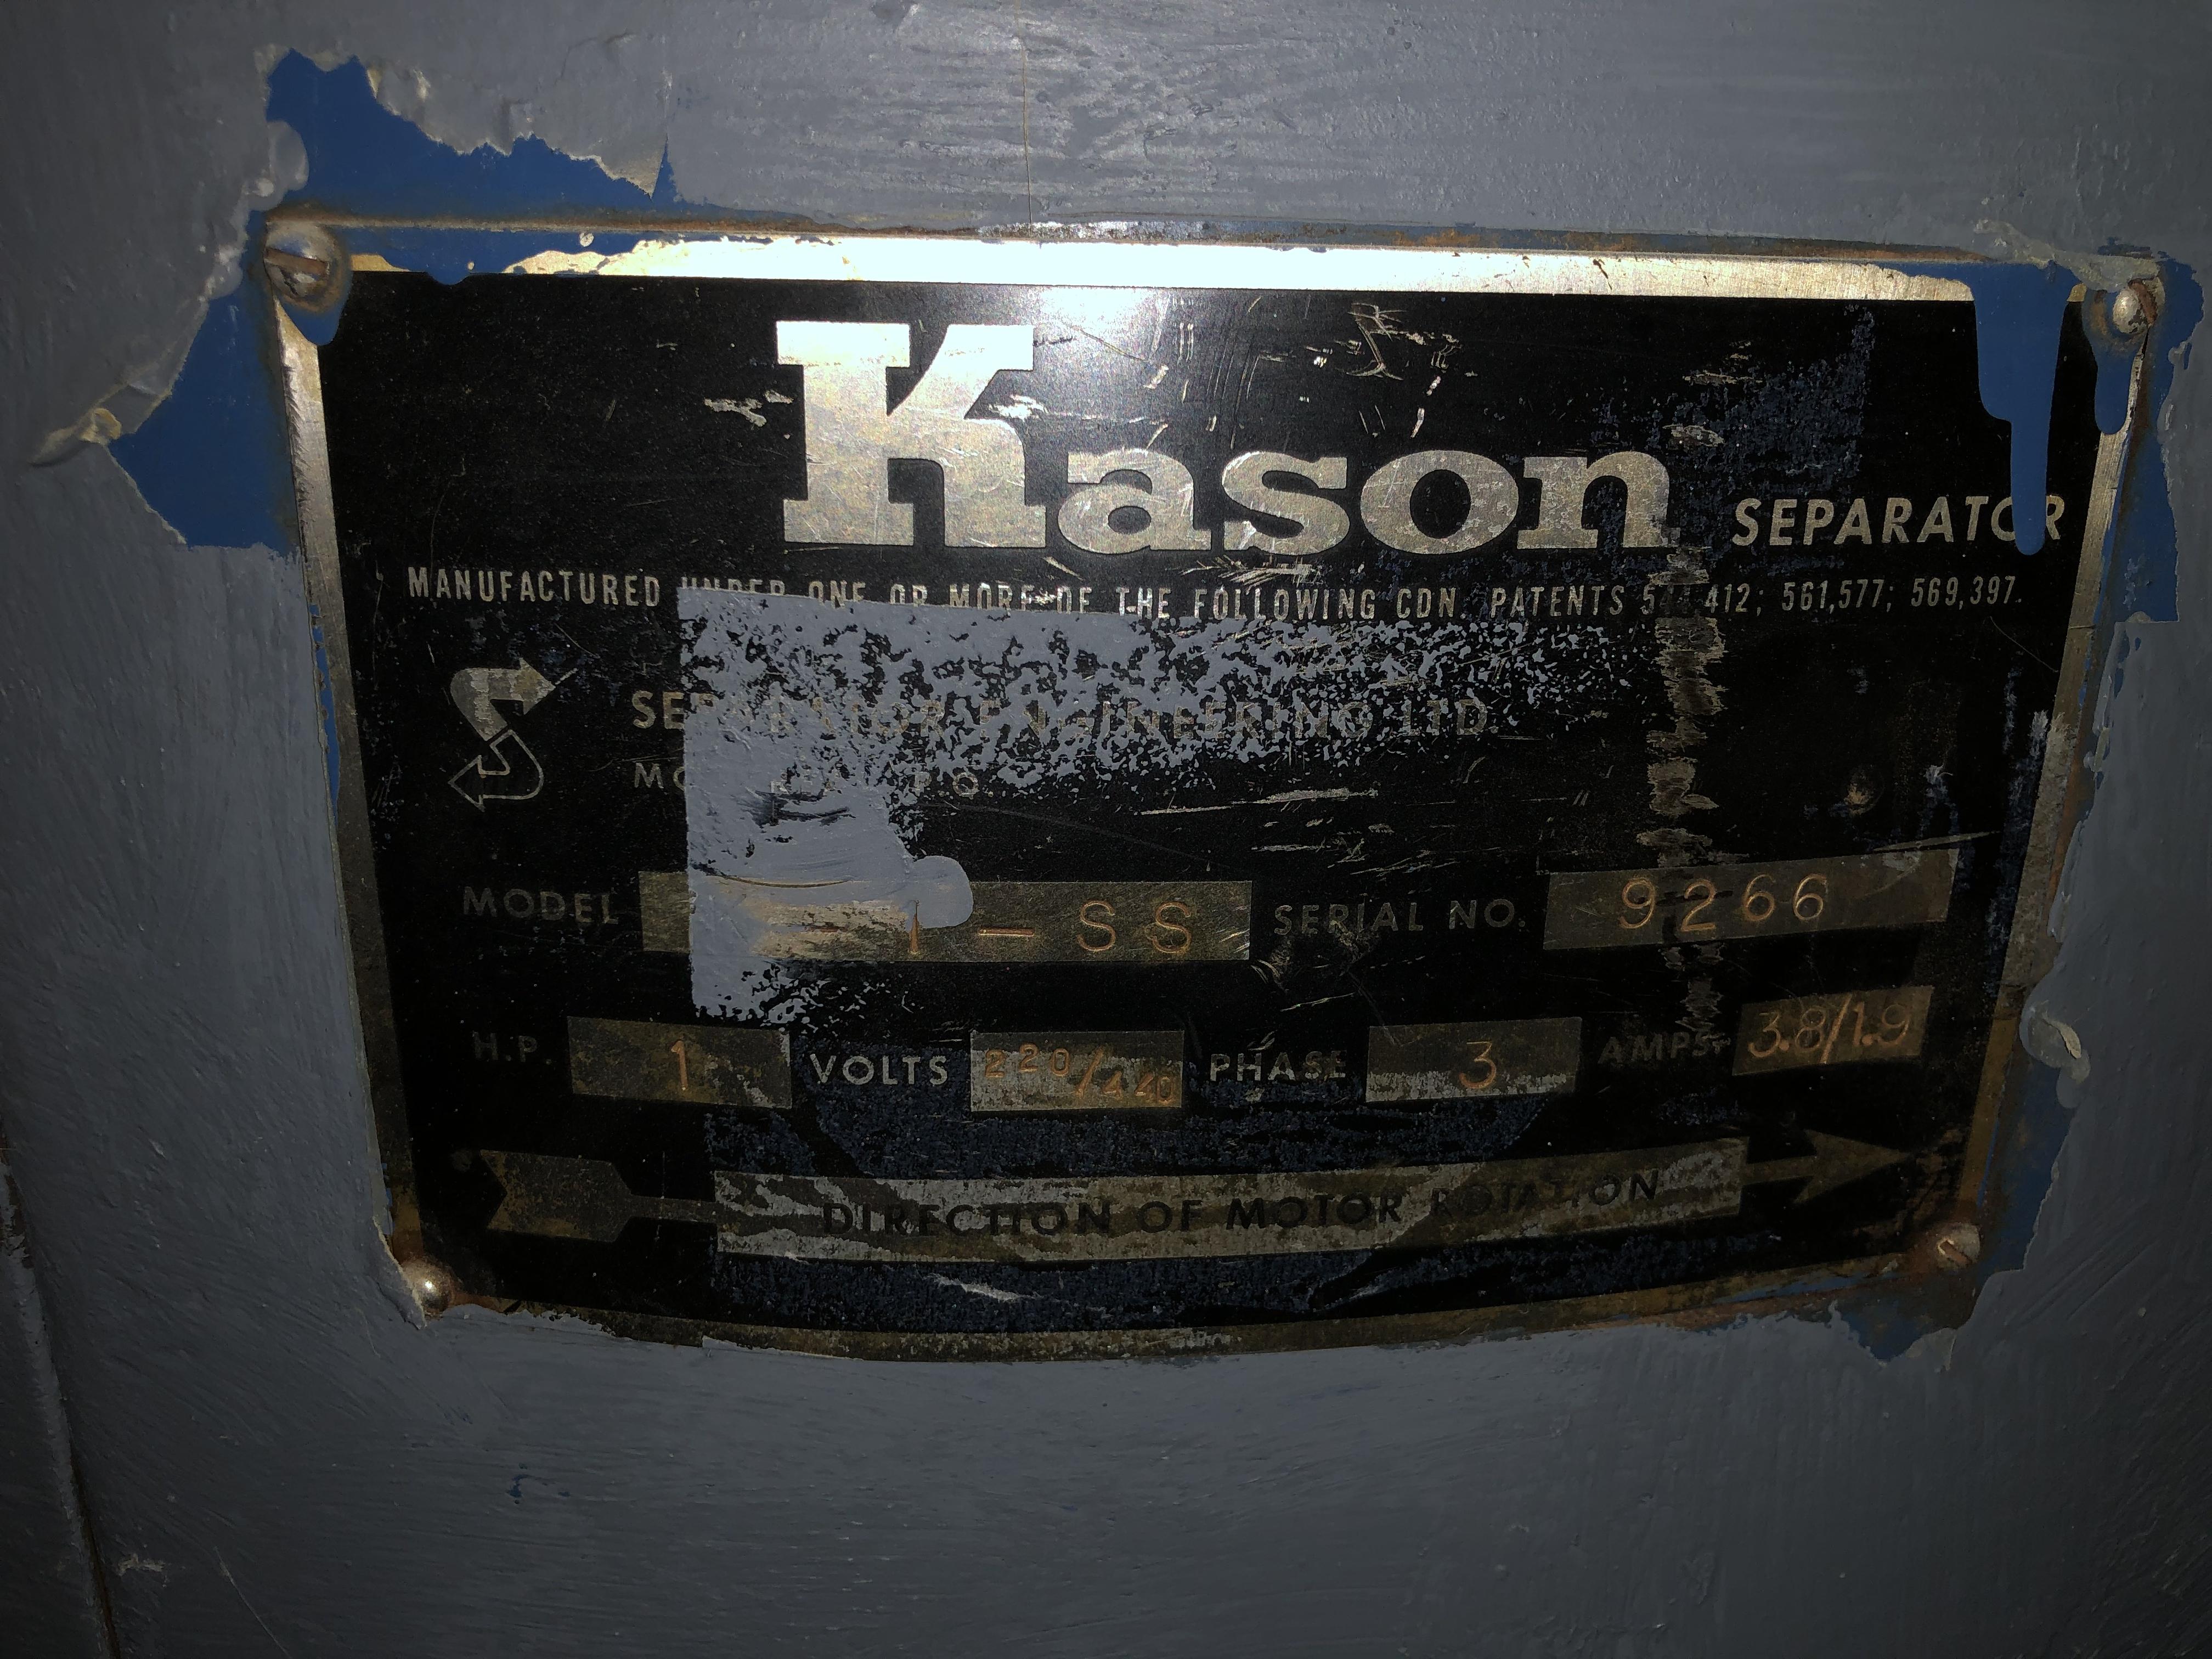 "Kason 48"" Diameter Vibratory Screen Separator, RIGGING FEE - $100 - Image 3 of 4"